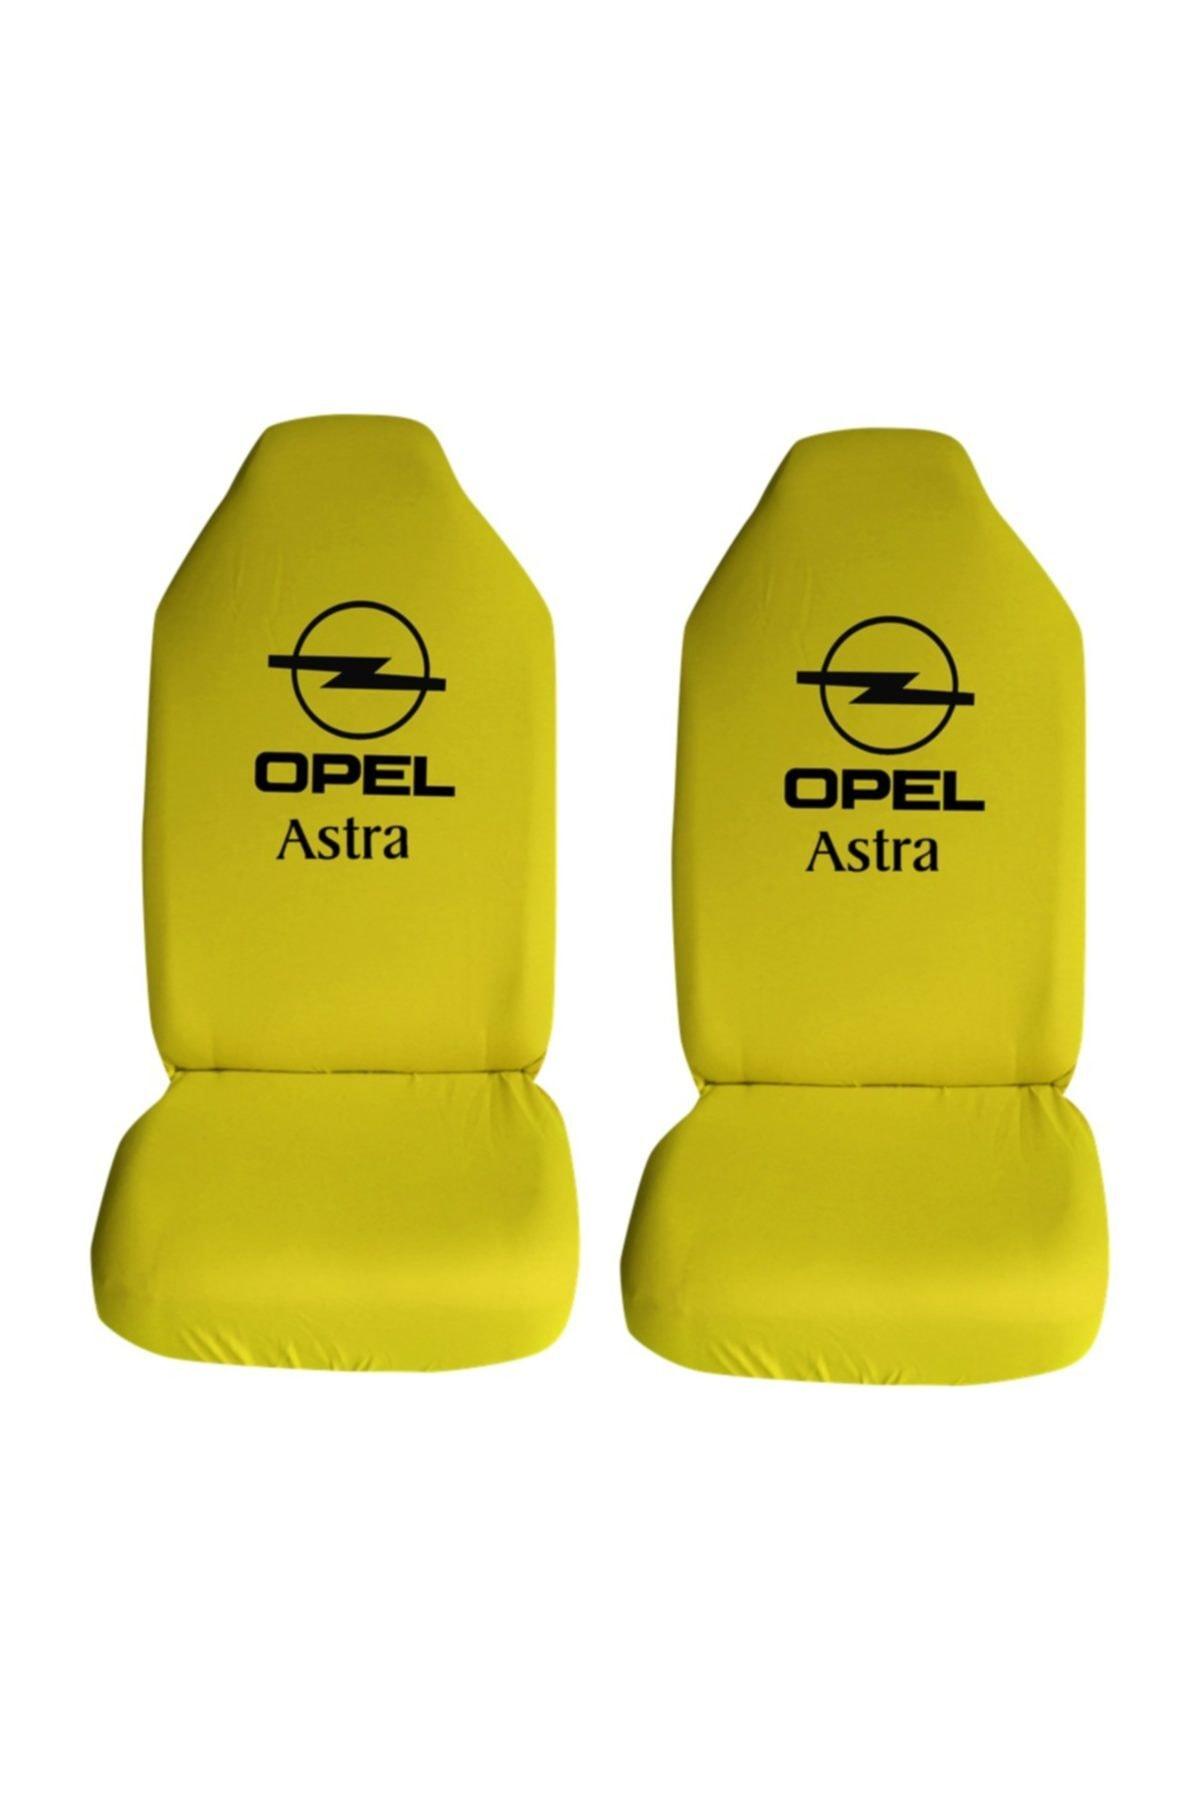 Modatools Opel Astra Ozel Araba Oto Koltuk Kilifi On Koltuklar Sari Penye Araca Ozel Baskili Trendyol